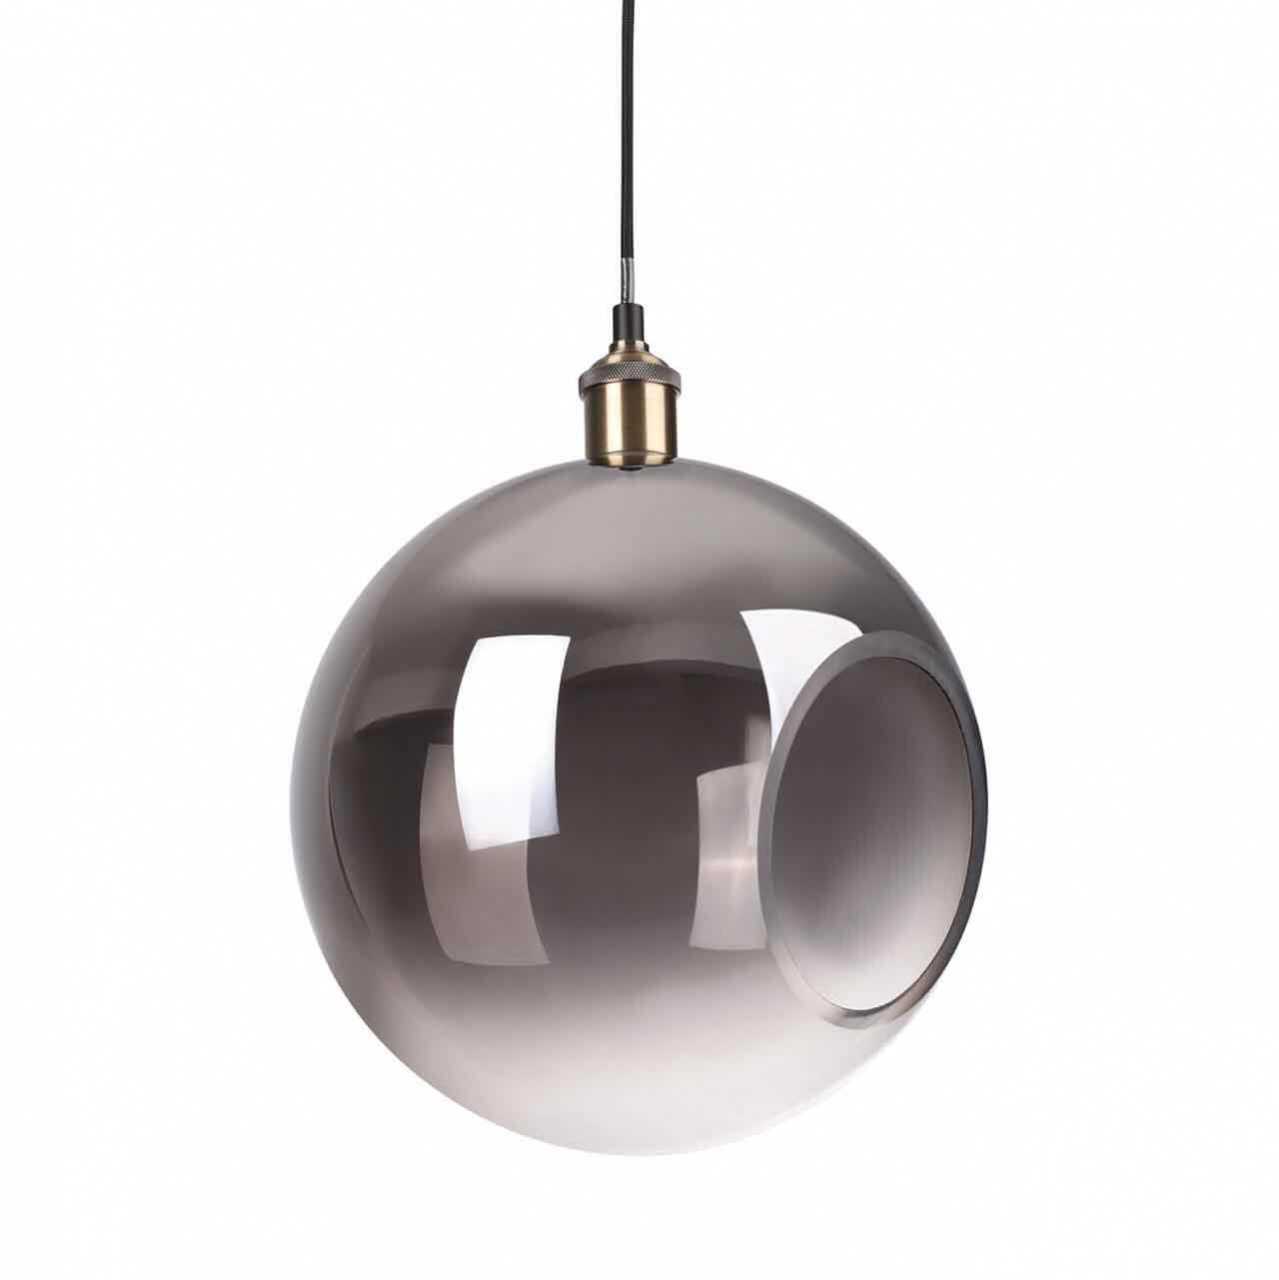 Светильник Ideal Lux Rustik SP1 Rustik подвесной светильник ideal lux wheel sp3 009681